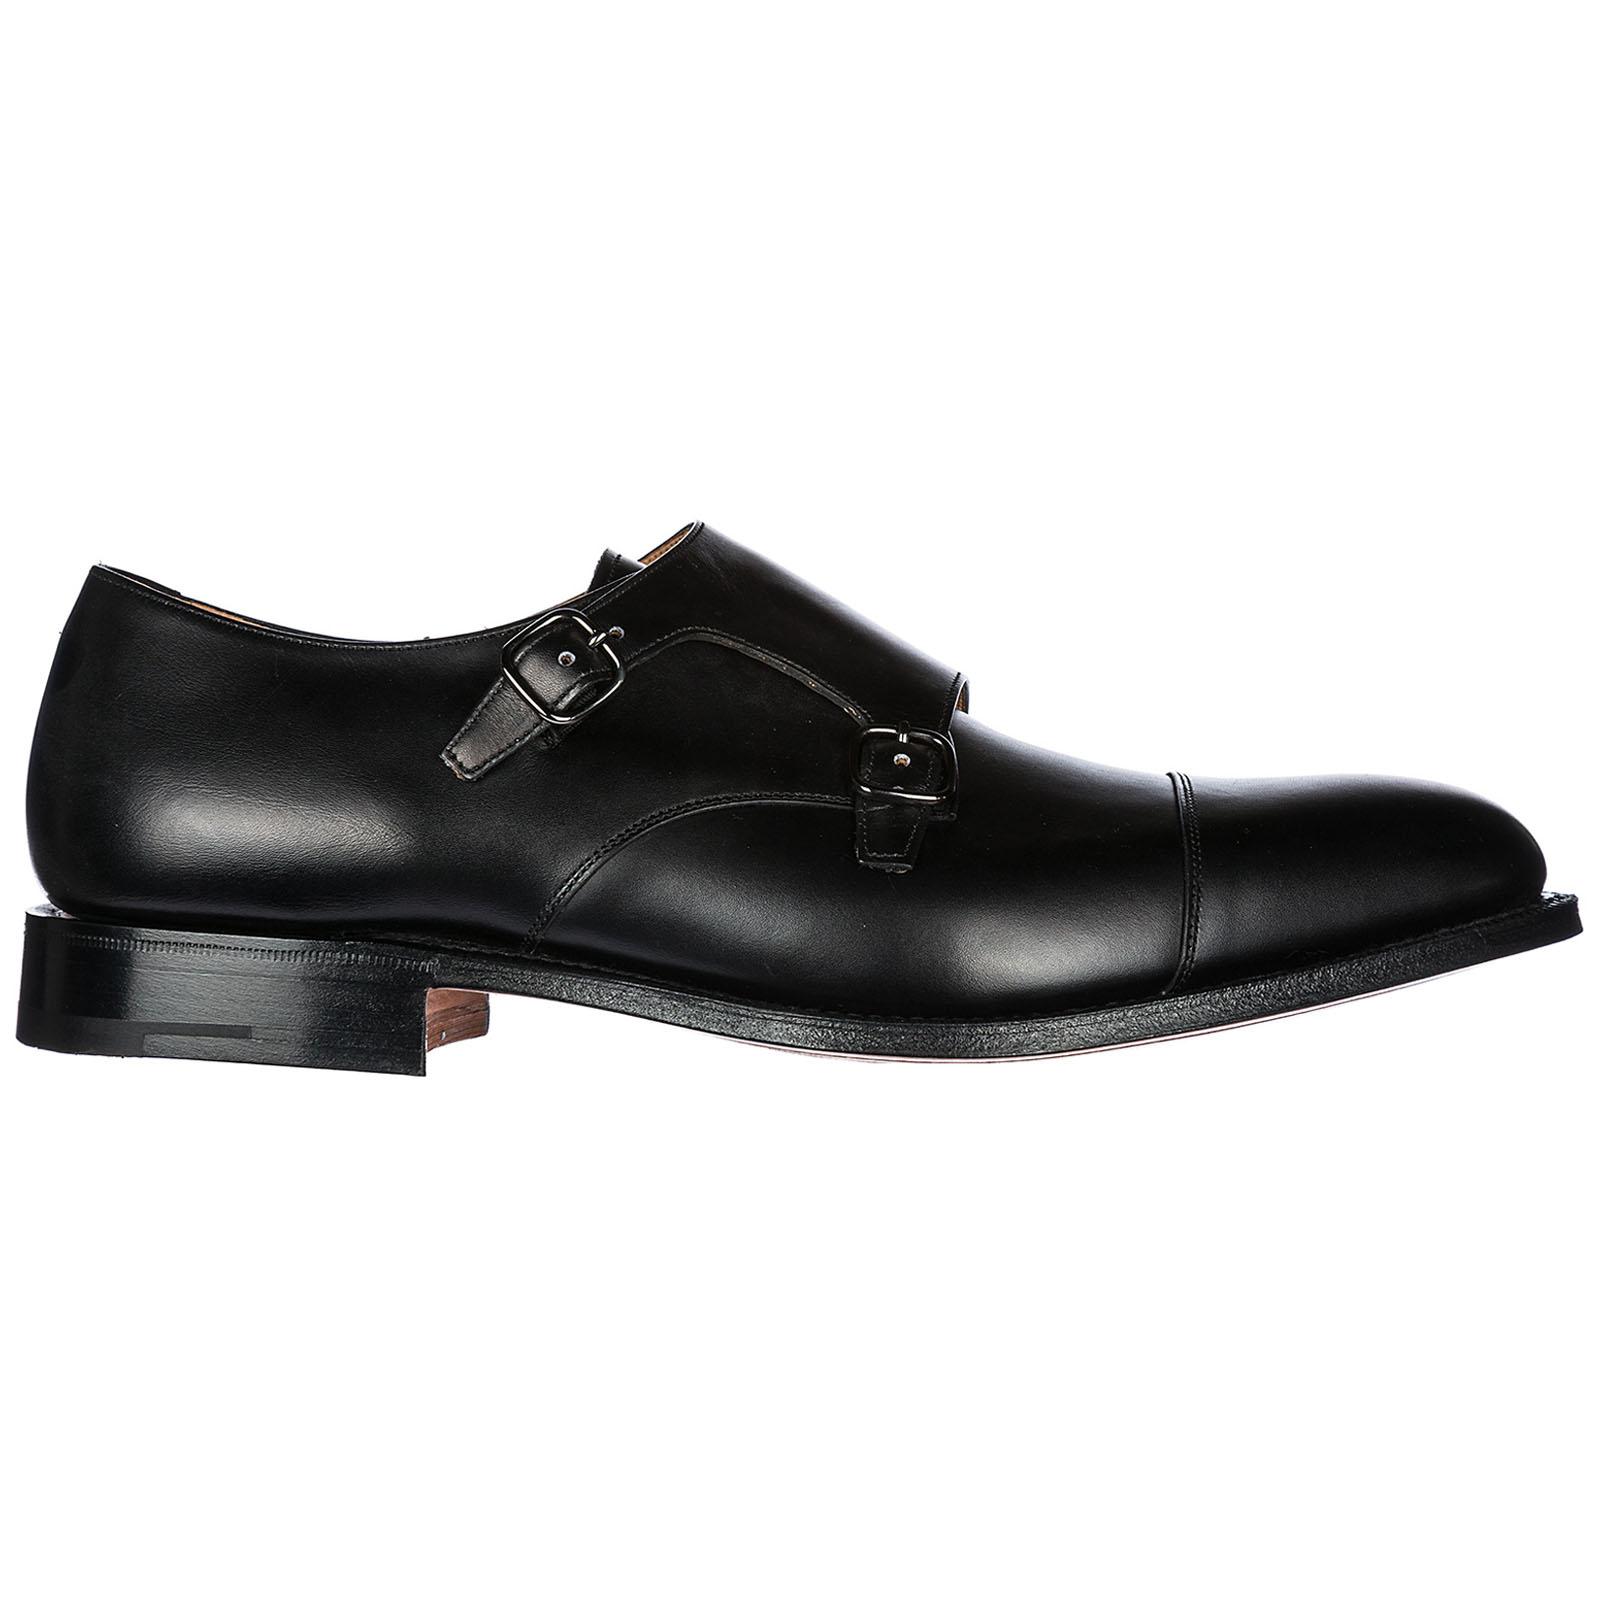 best sneakers 58350 45a30 Herrenschuhe Leder Herren Business Schuhe Schnürschuhe Detroit, Black